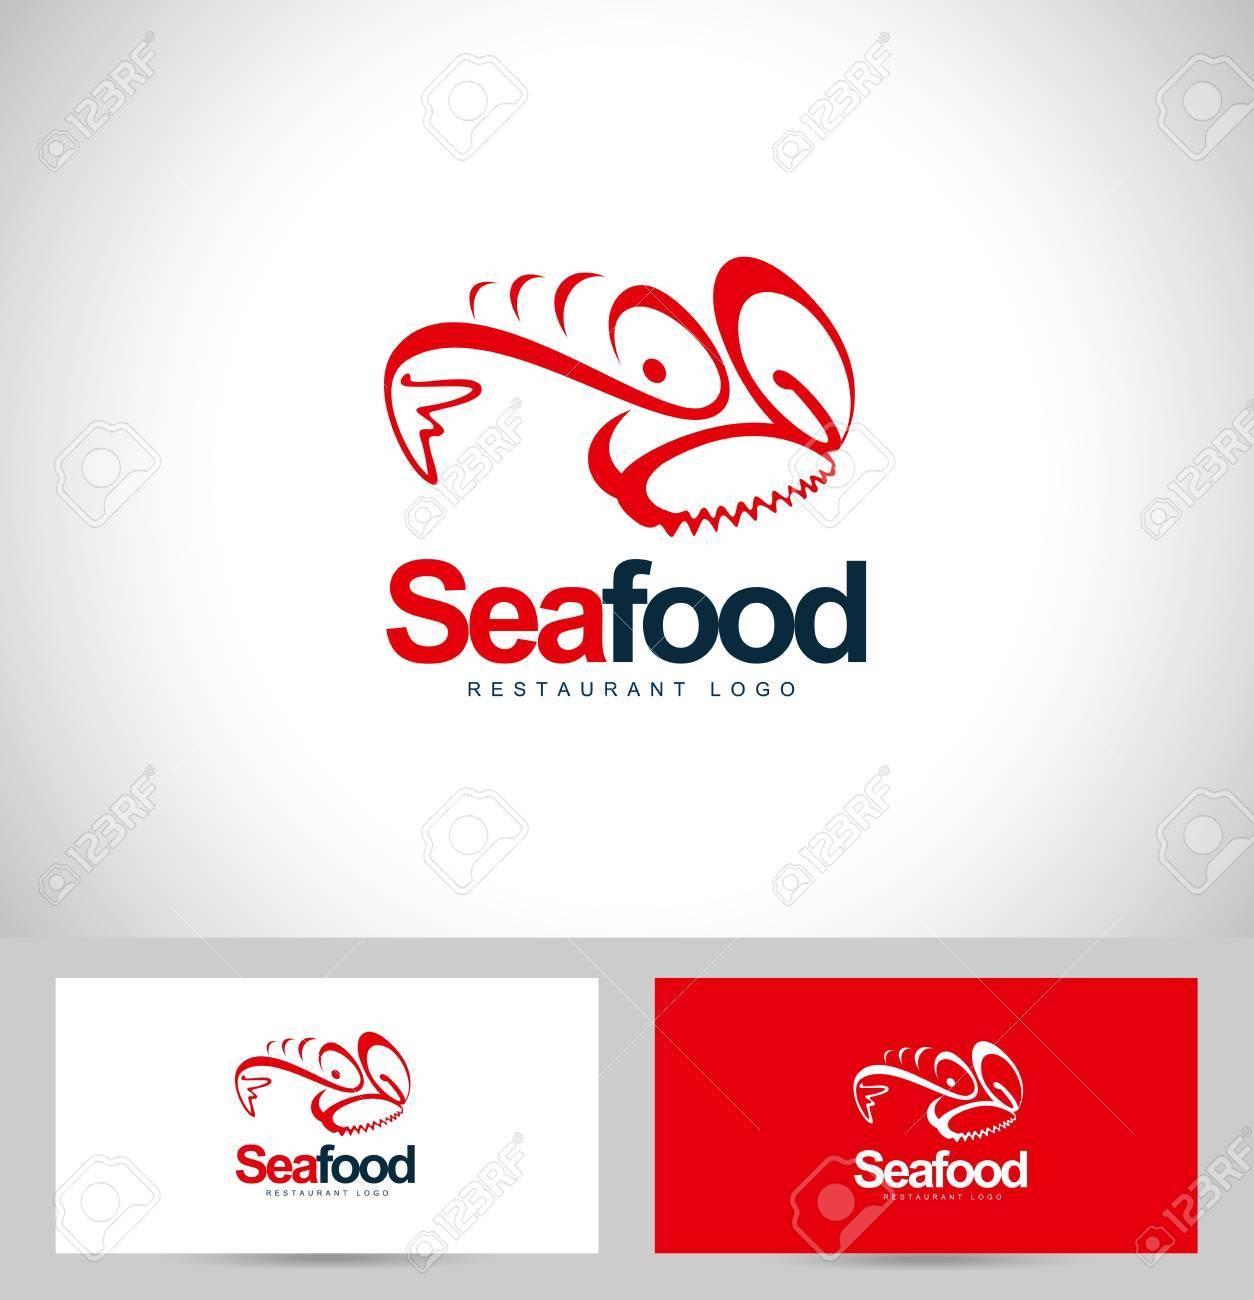 Seafood Restaurant Design Concept Creatif Avec Le Modele De Carte